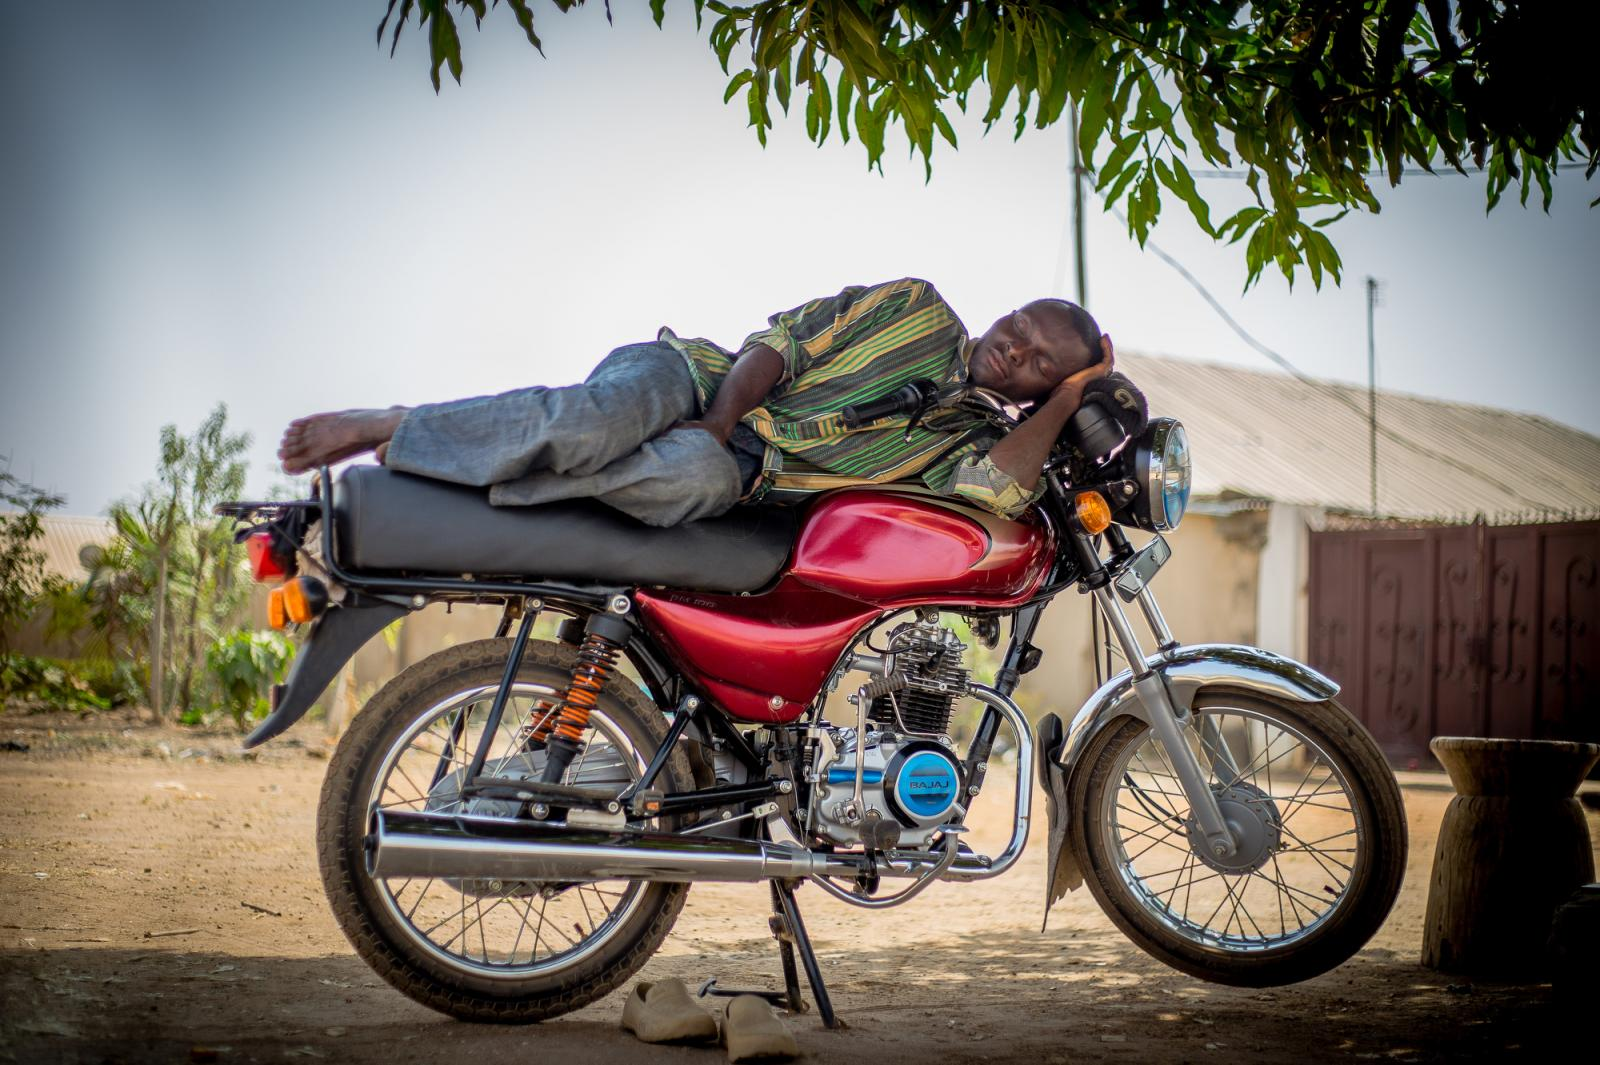 Photography image - Loading Sleeping_On_Duty_Adeyinka_Yusuf_02.JPG